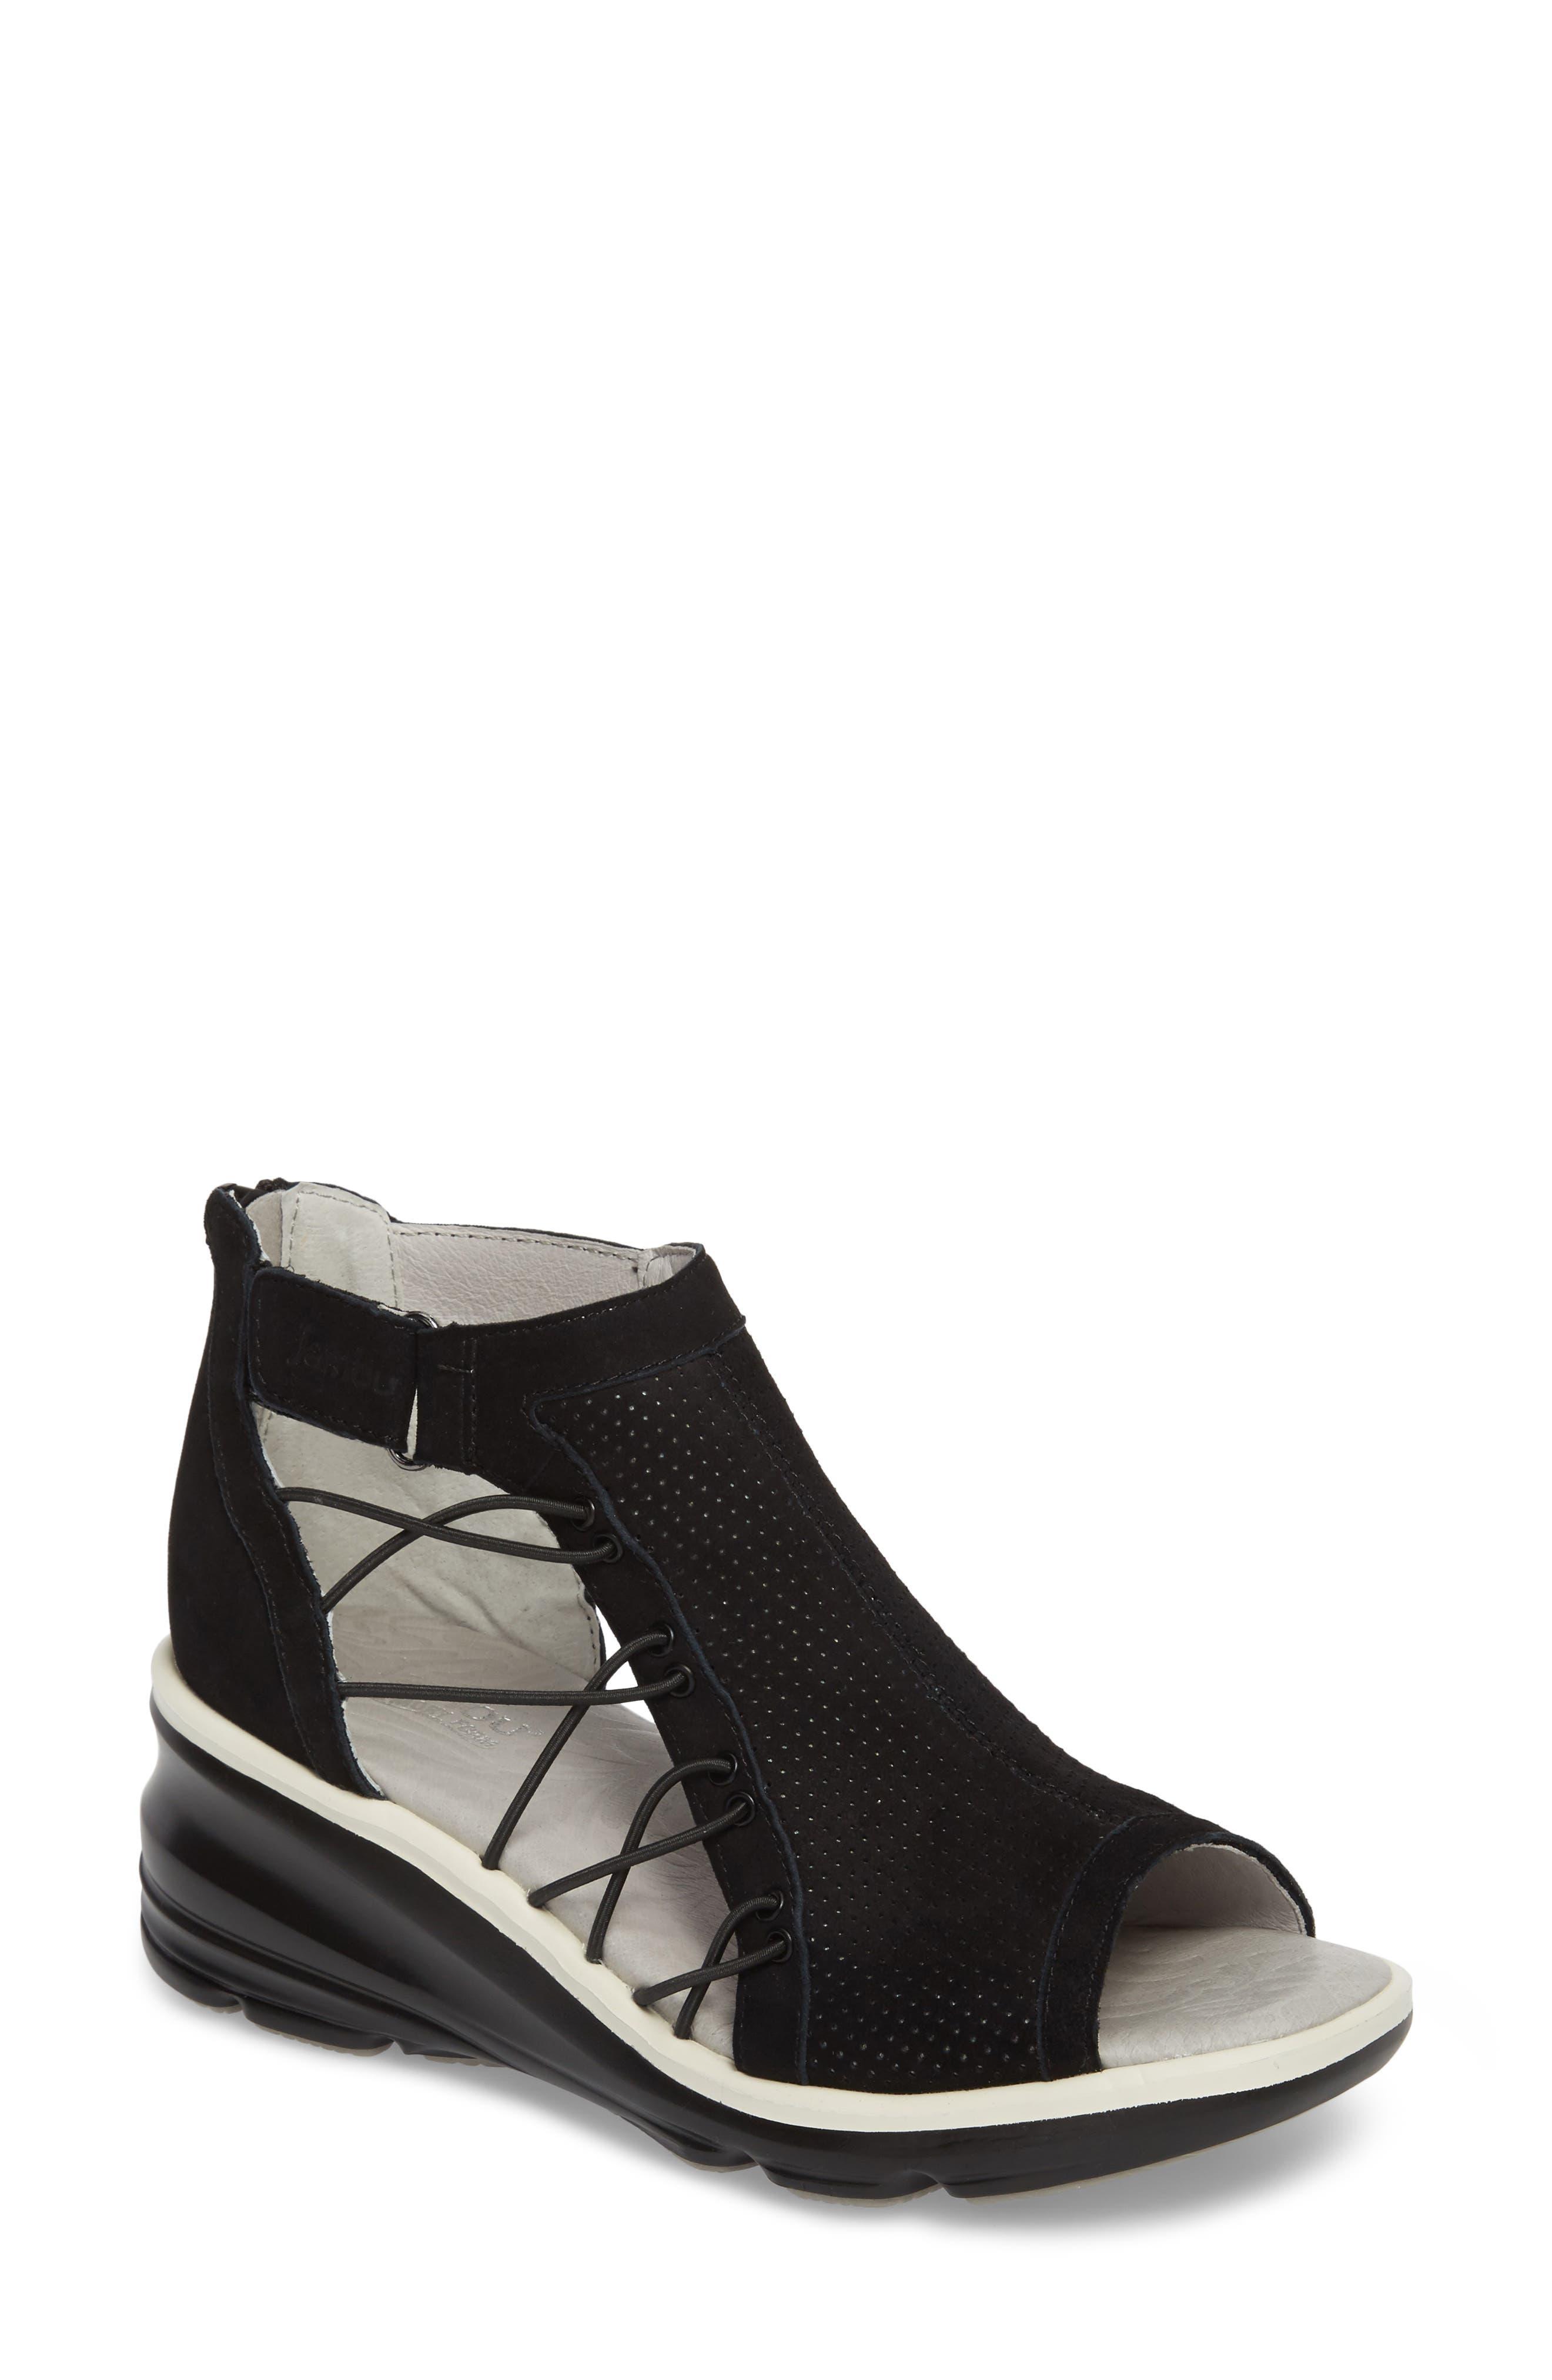 Alternate Image 1 Selected - Jambu Naomi Perforated Wedge Sandal (Women)